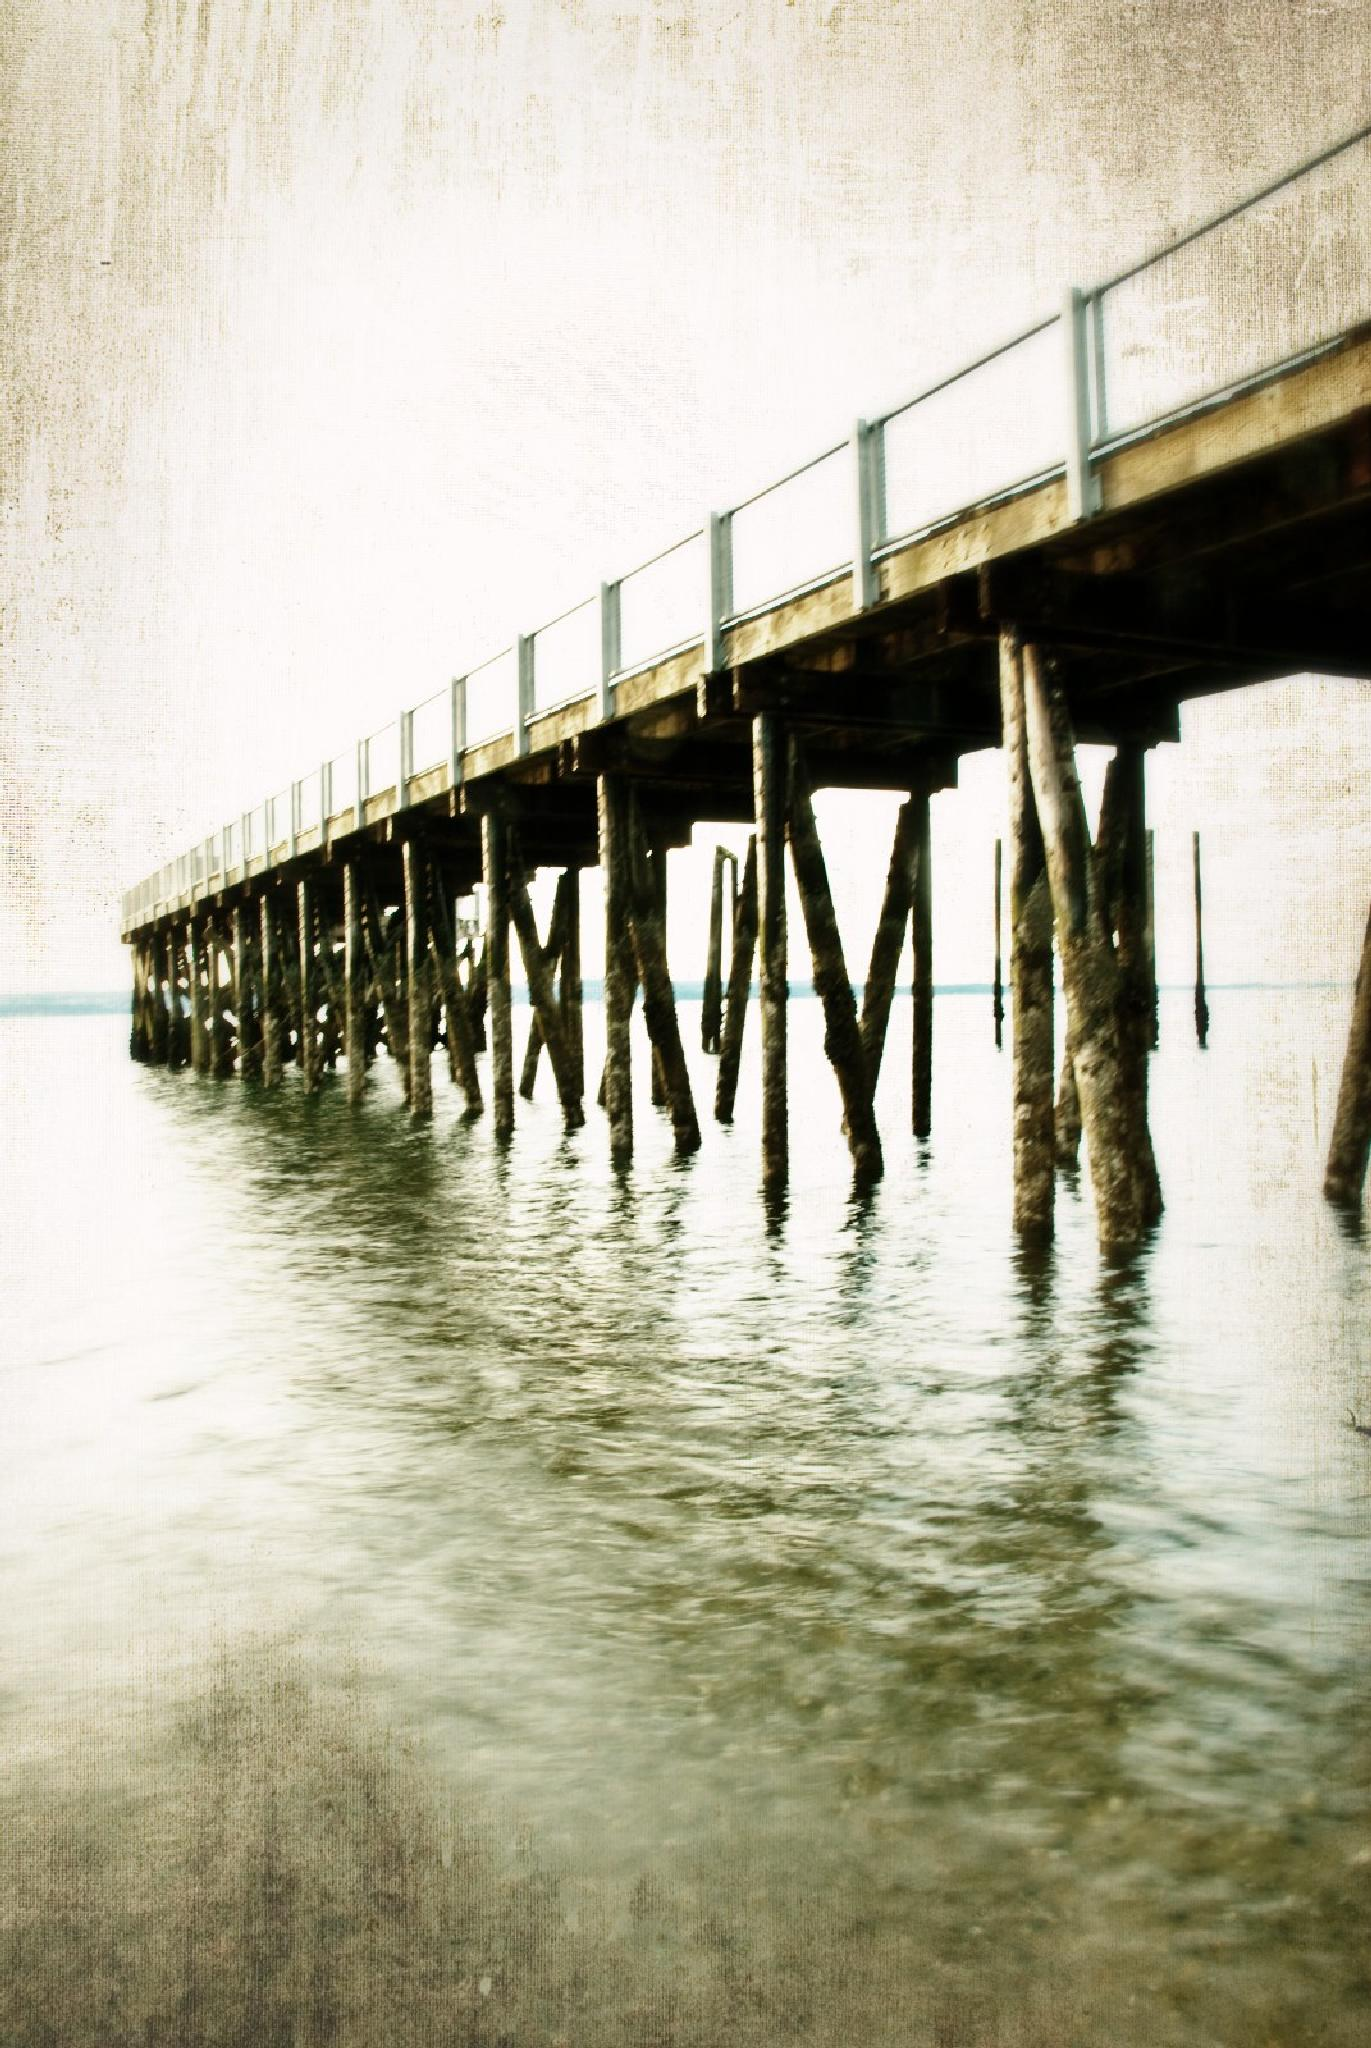 The Pier by Brenda Hartman